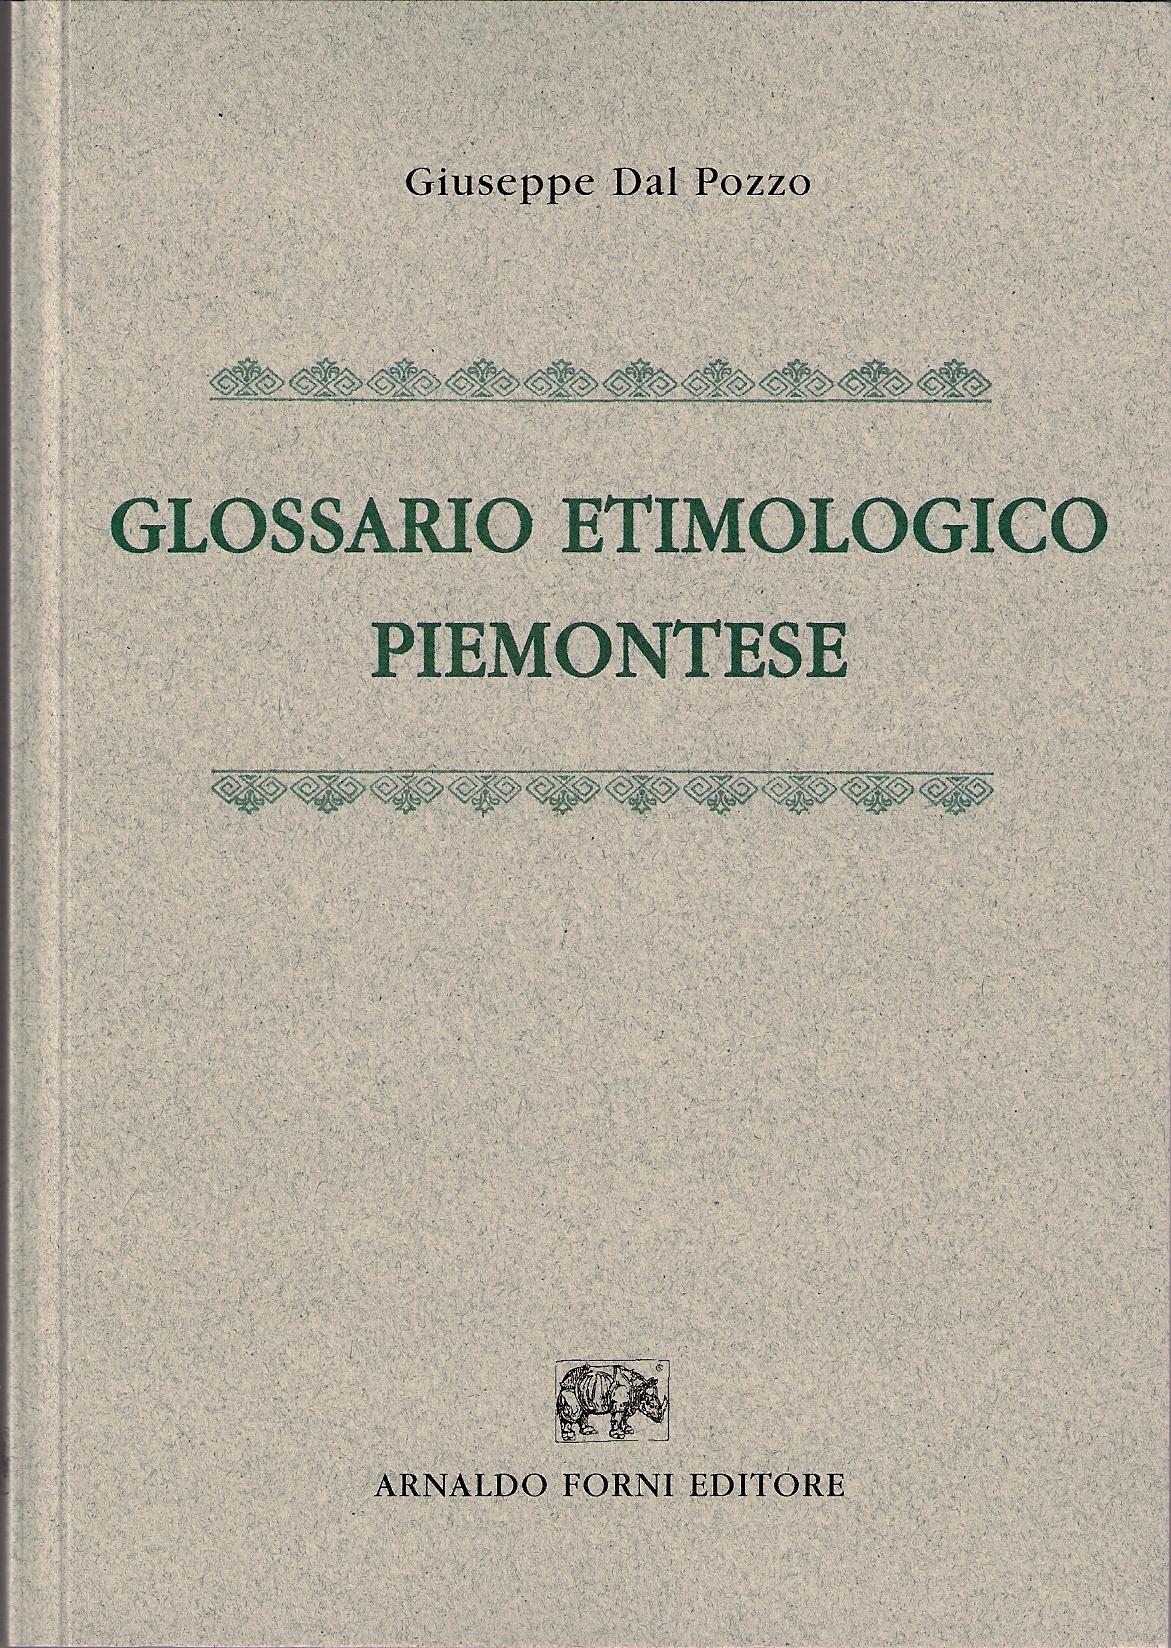 Glossario etimologico piemontese